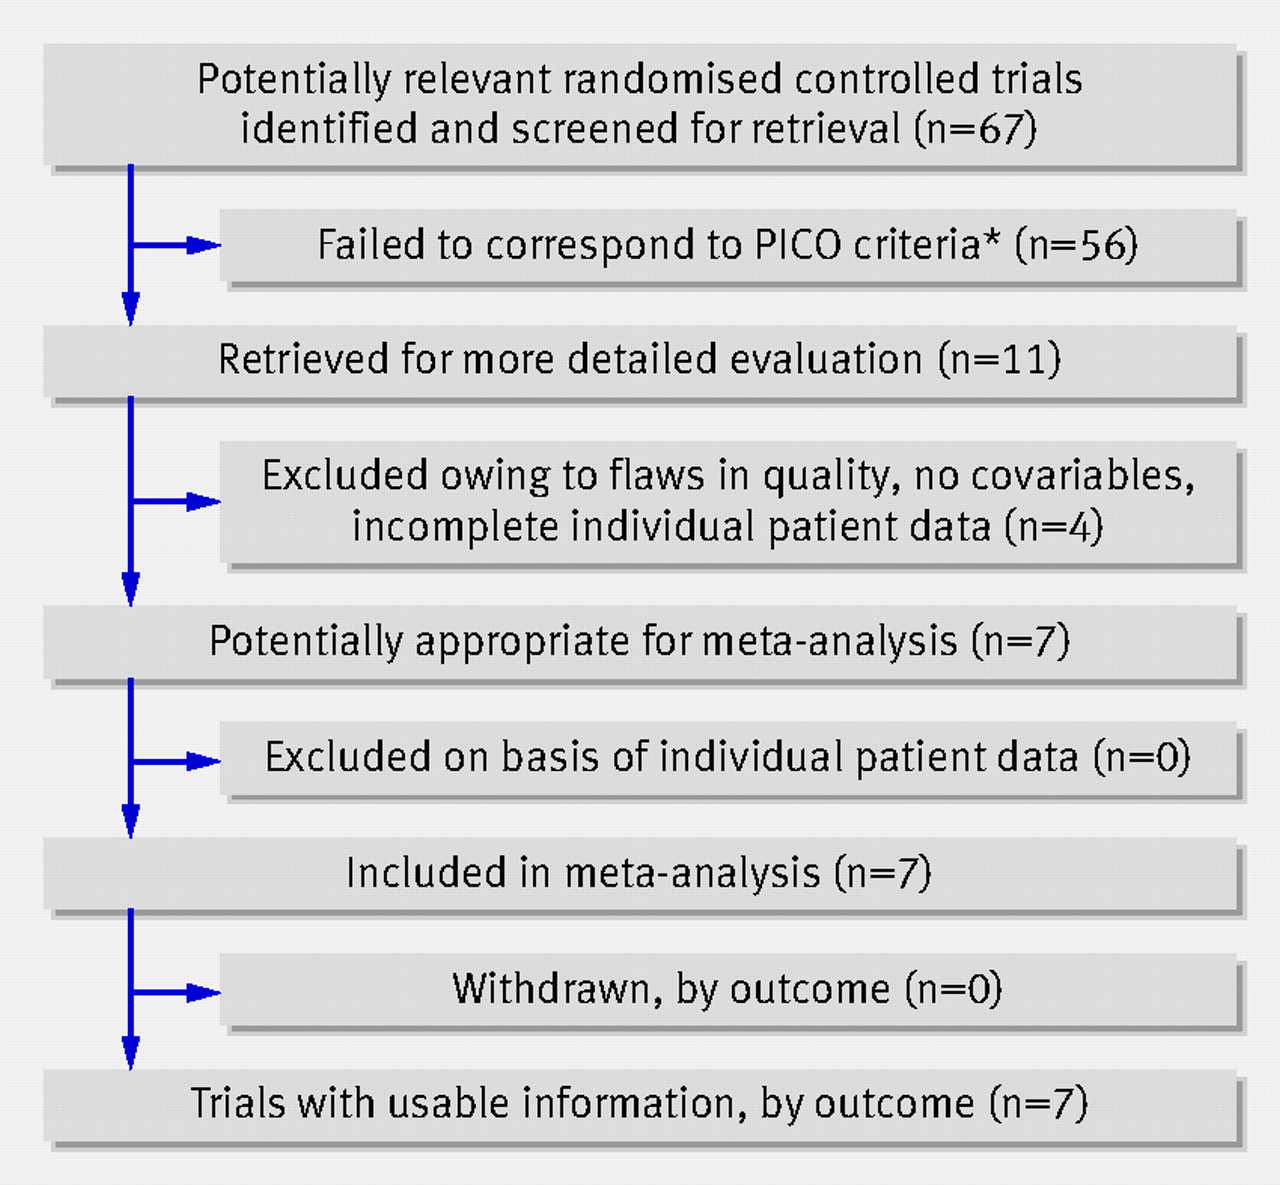 Naftidrofuryl for intermittent claudication: meta-analysis ...